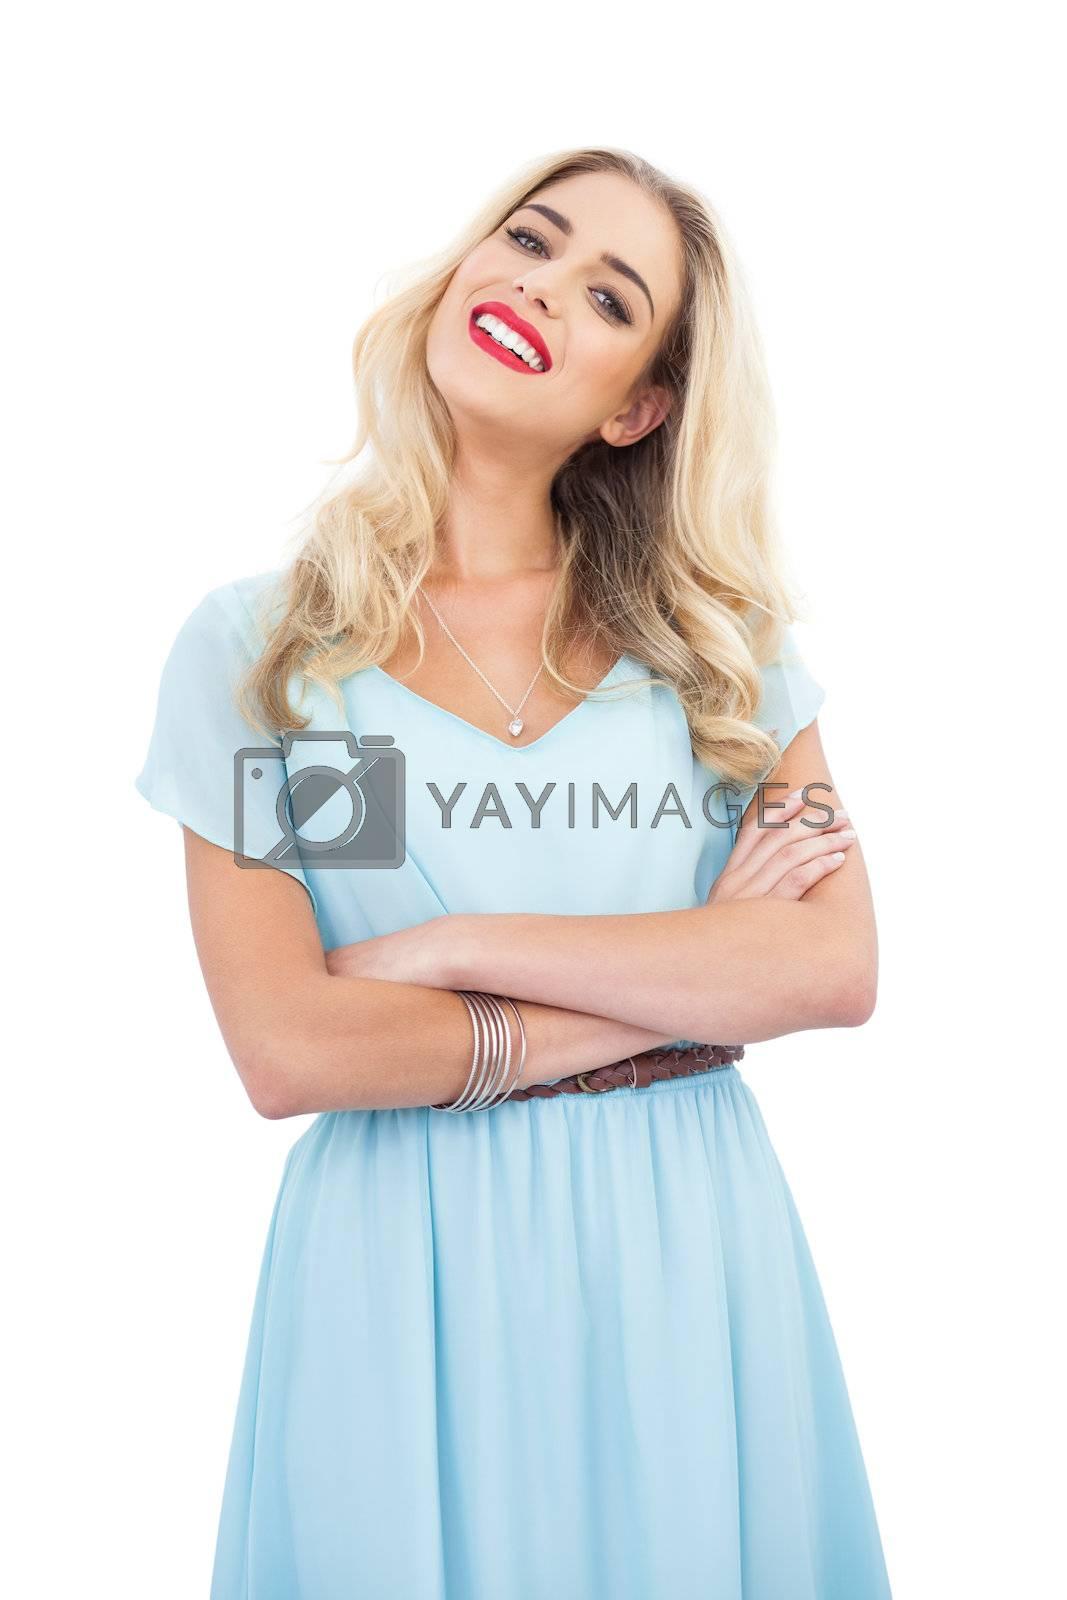 Content blonde model in blue dress posing crossed arms by Wavebreakmedia